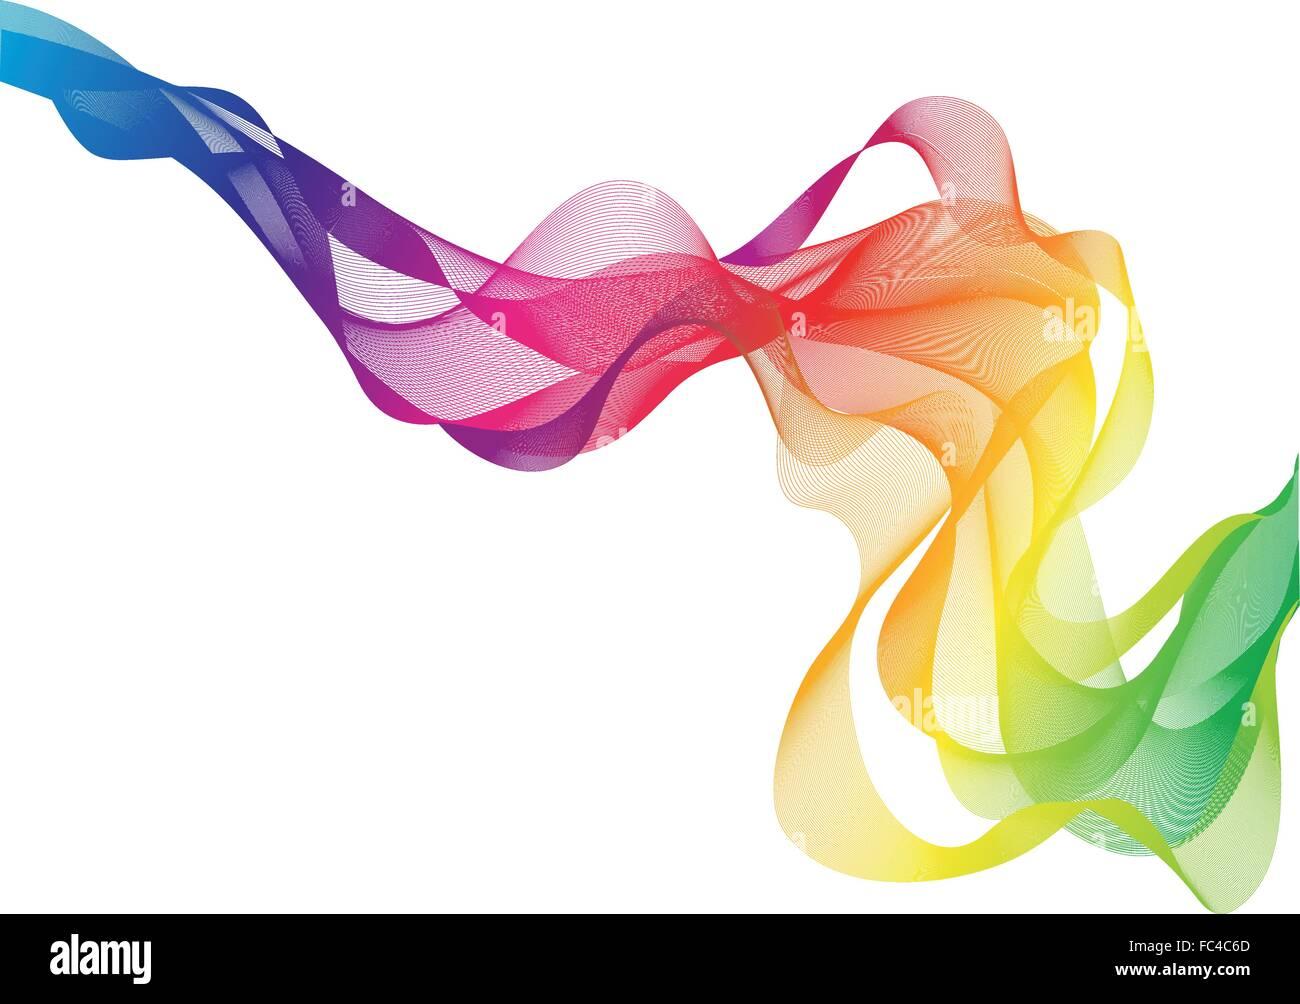 abstrakten bunten Rauch, Vektor-Hintergrund Stockbild